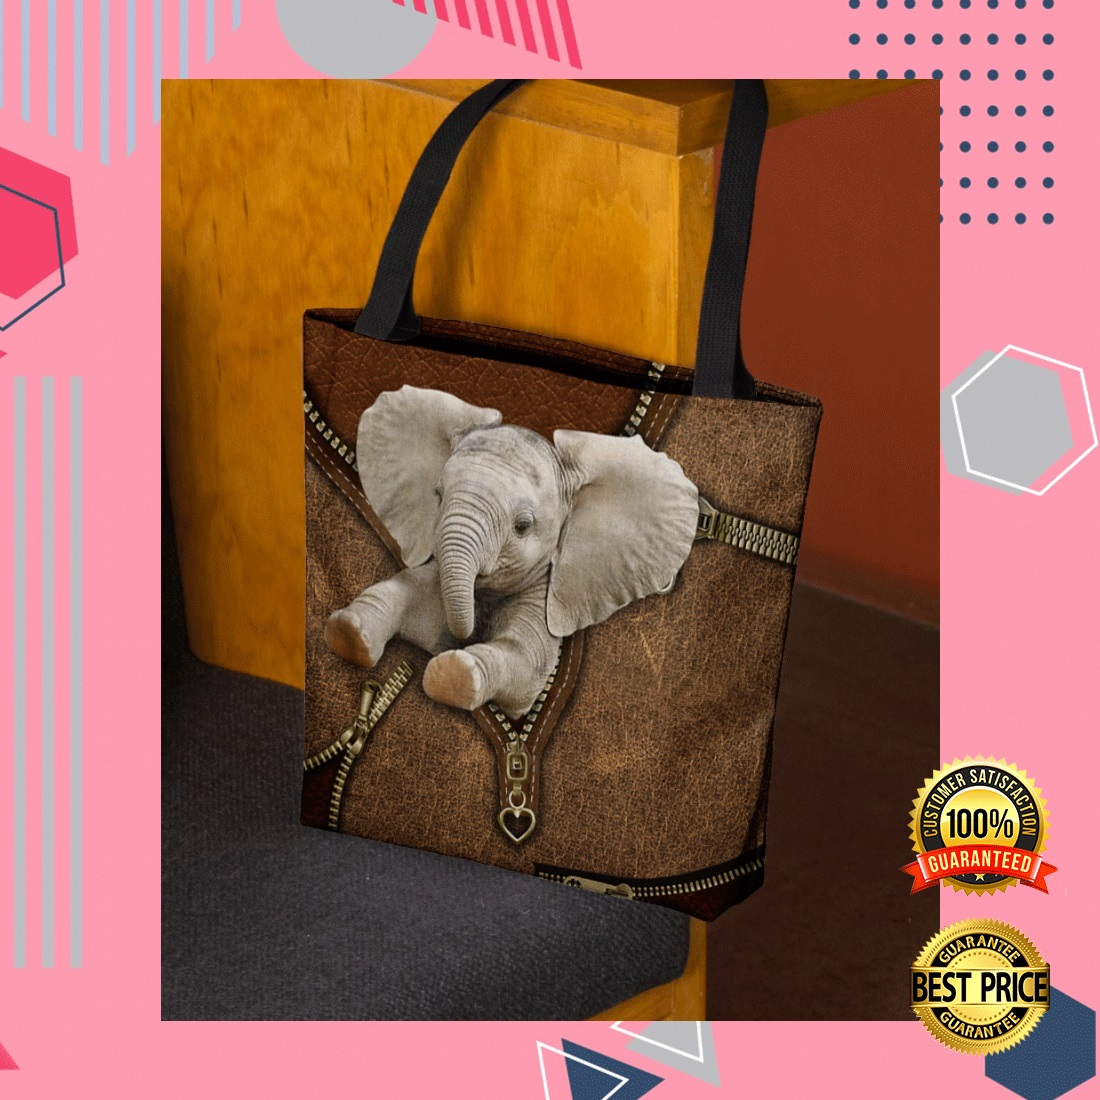 ELEPHANT ZIPPER TOTE BAG 4